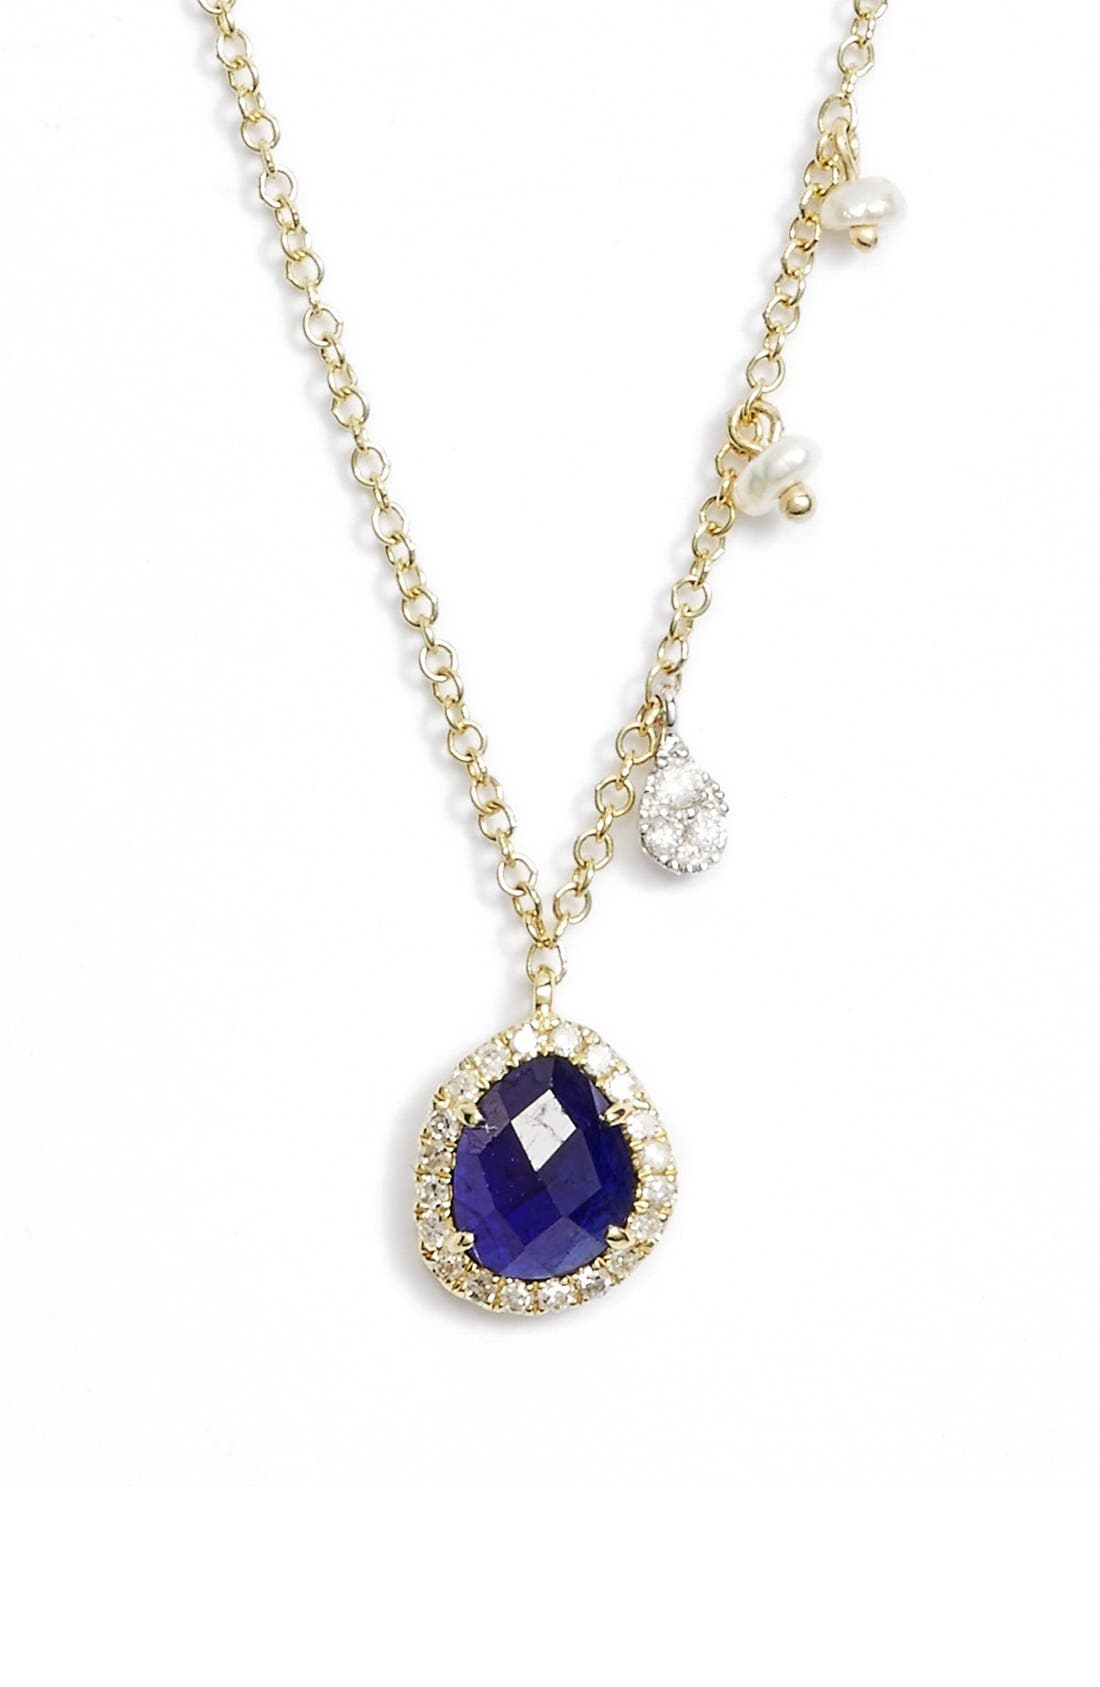 Mini Stone Diamond Pendant Necklace,                             Main thumbnail 1, color,                             YELLOW GOLD/ BLUE SAPPHIRE